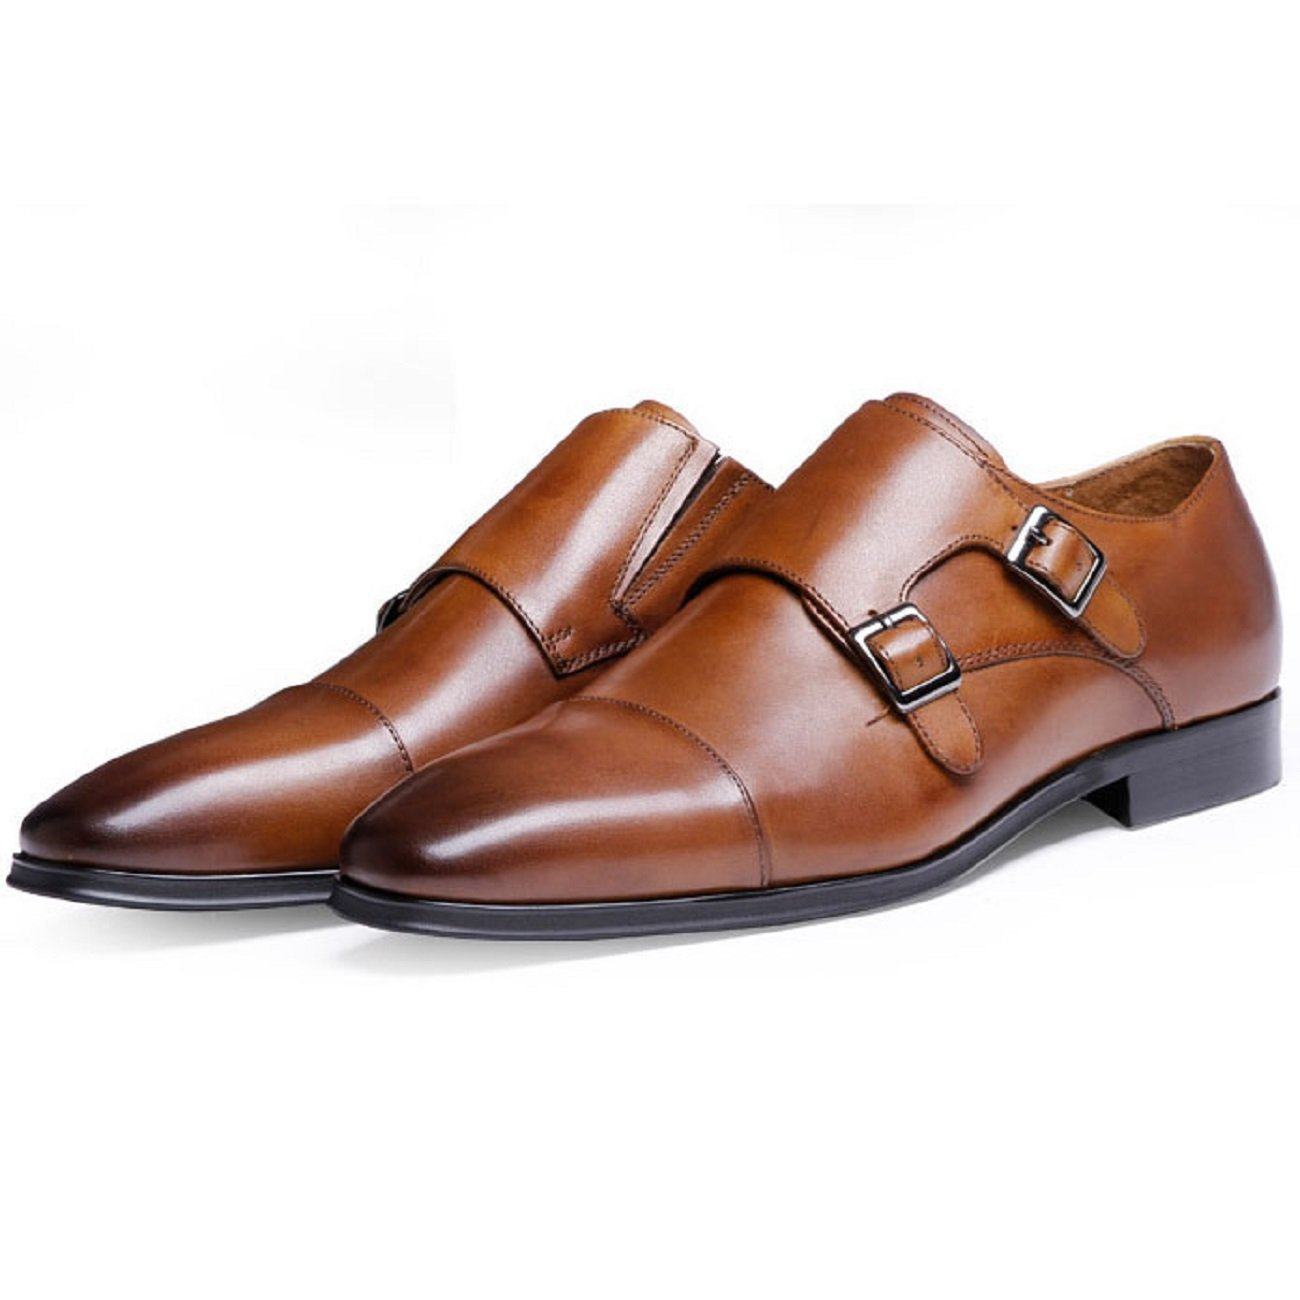 DESAI Genuine Leather Monk Strap Dress Shoes for Men